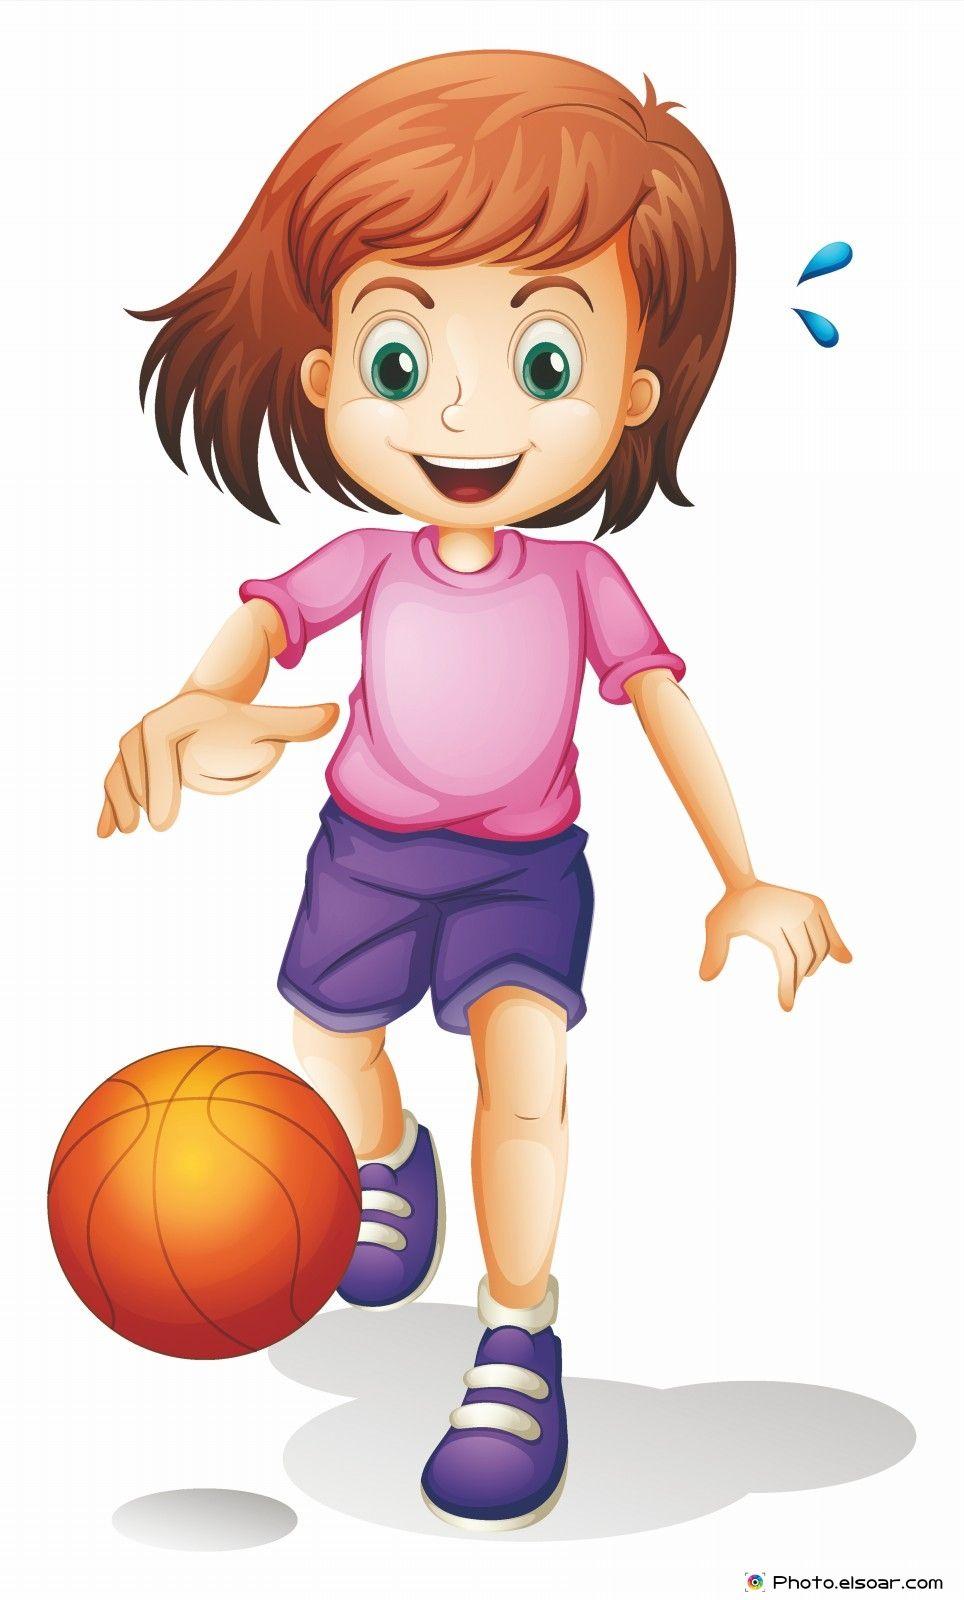 Little Girl Playing Volleyball Cartoon Clipart Vector Friendlystock Cartoon Clip Art Children Illustration Sport Illustration